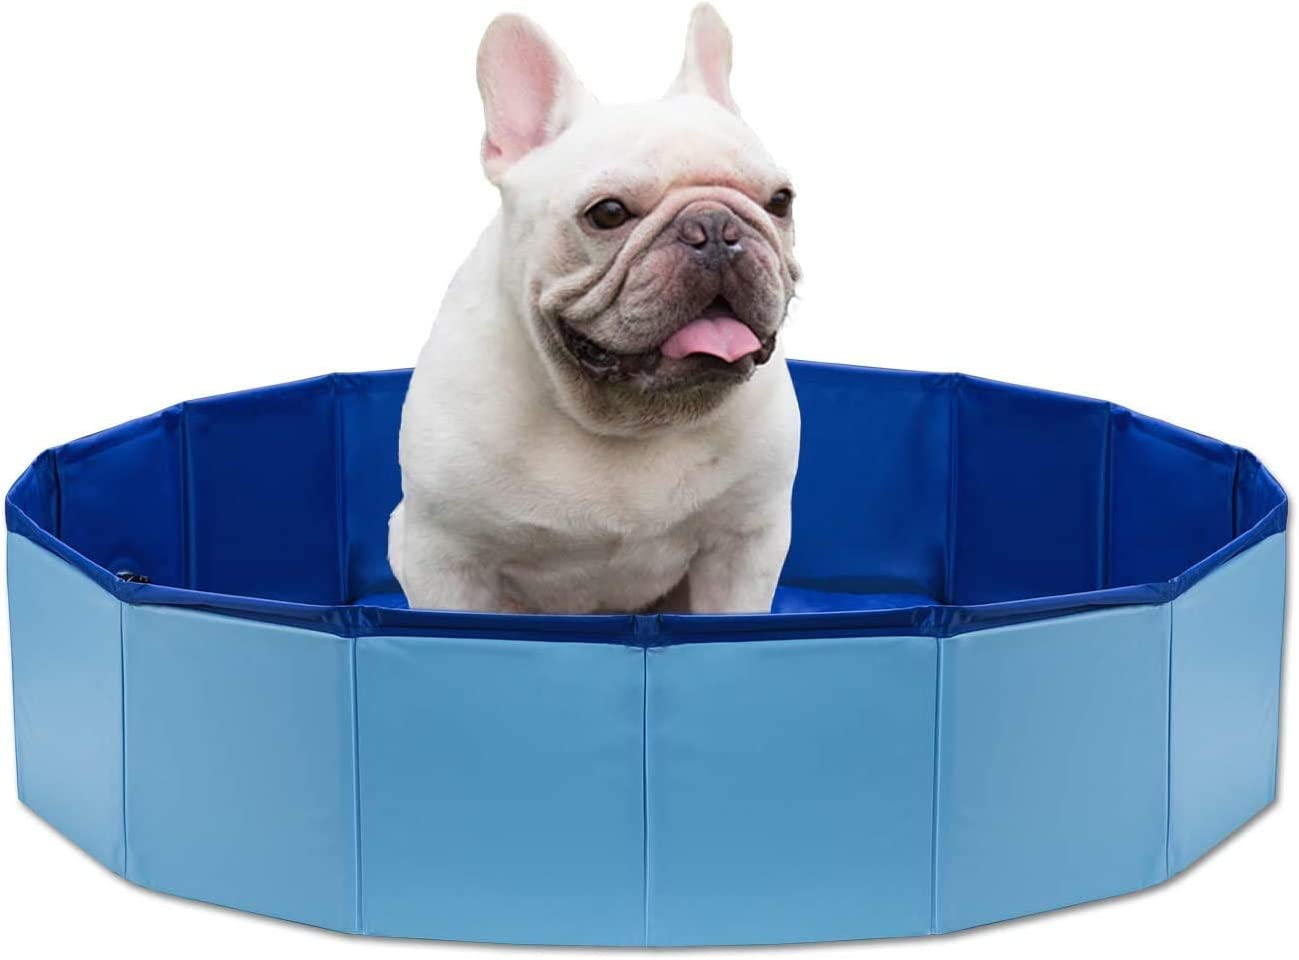 DY_Jin Piscina Plegable para Mascotas, bañera Plegable portátil para Perros, Piscina de Agua Redonda de PVC a Prueba de Fugas, Estanque de Lavado para Jugar en Interiores y Exteriores(120 * 30